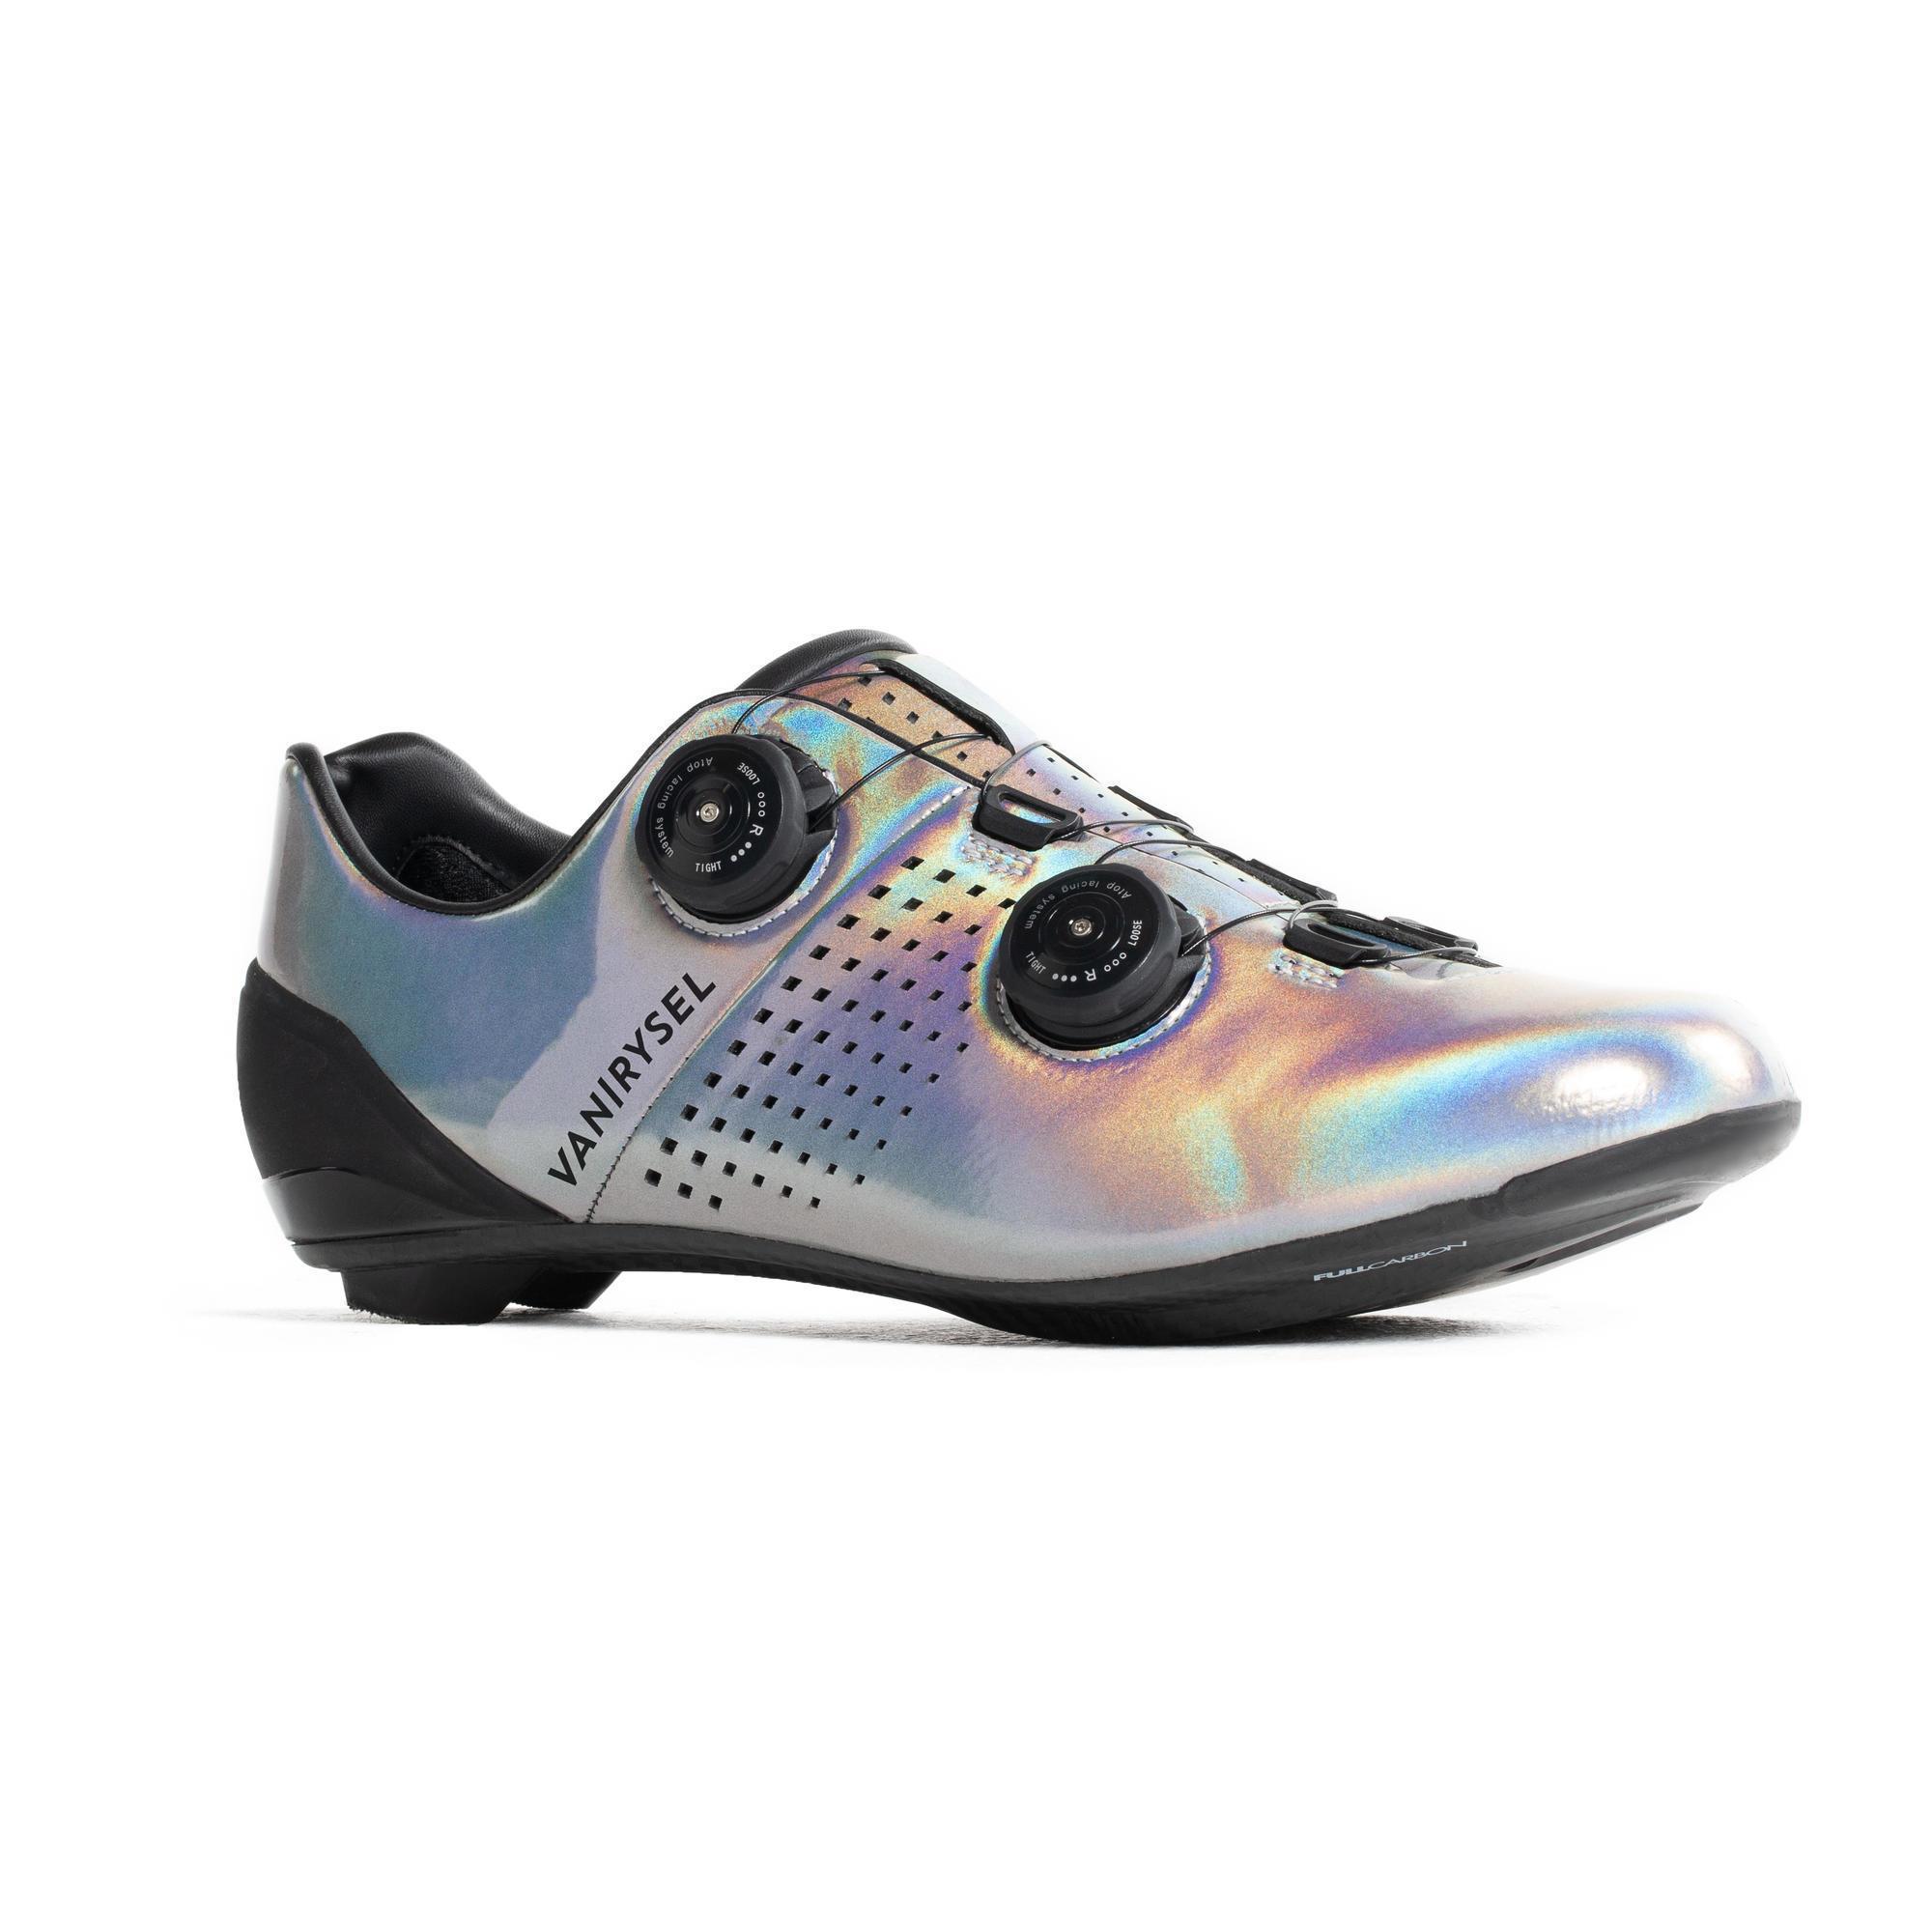 e57cdbb50 Comprar Zapatillas Ciclismo Online